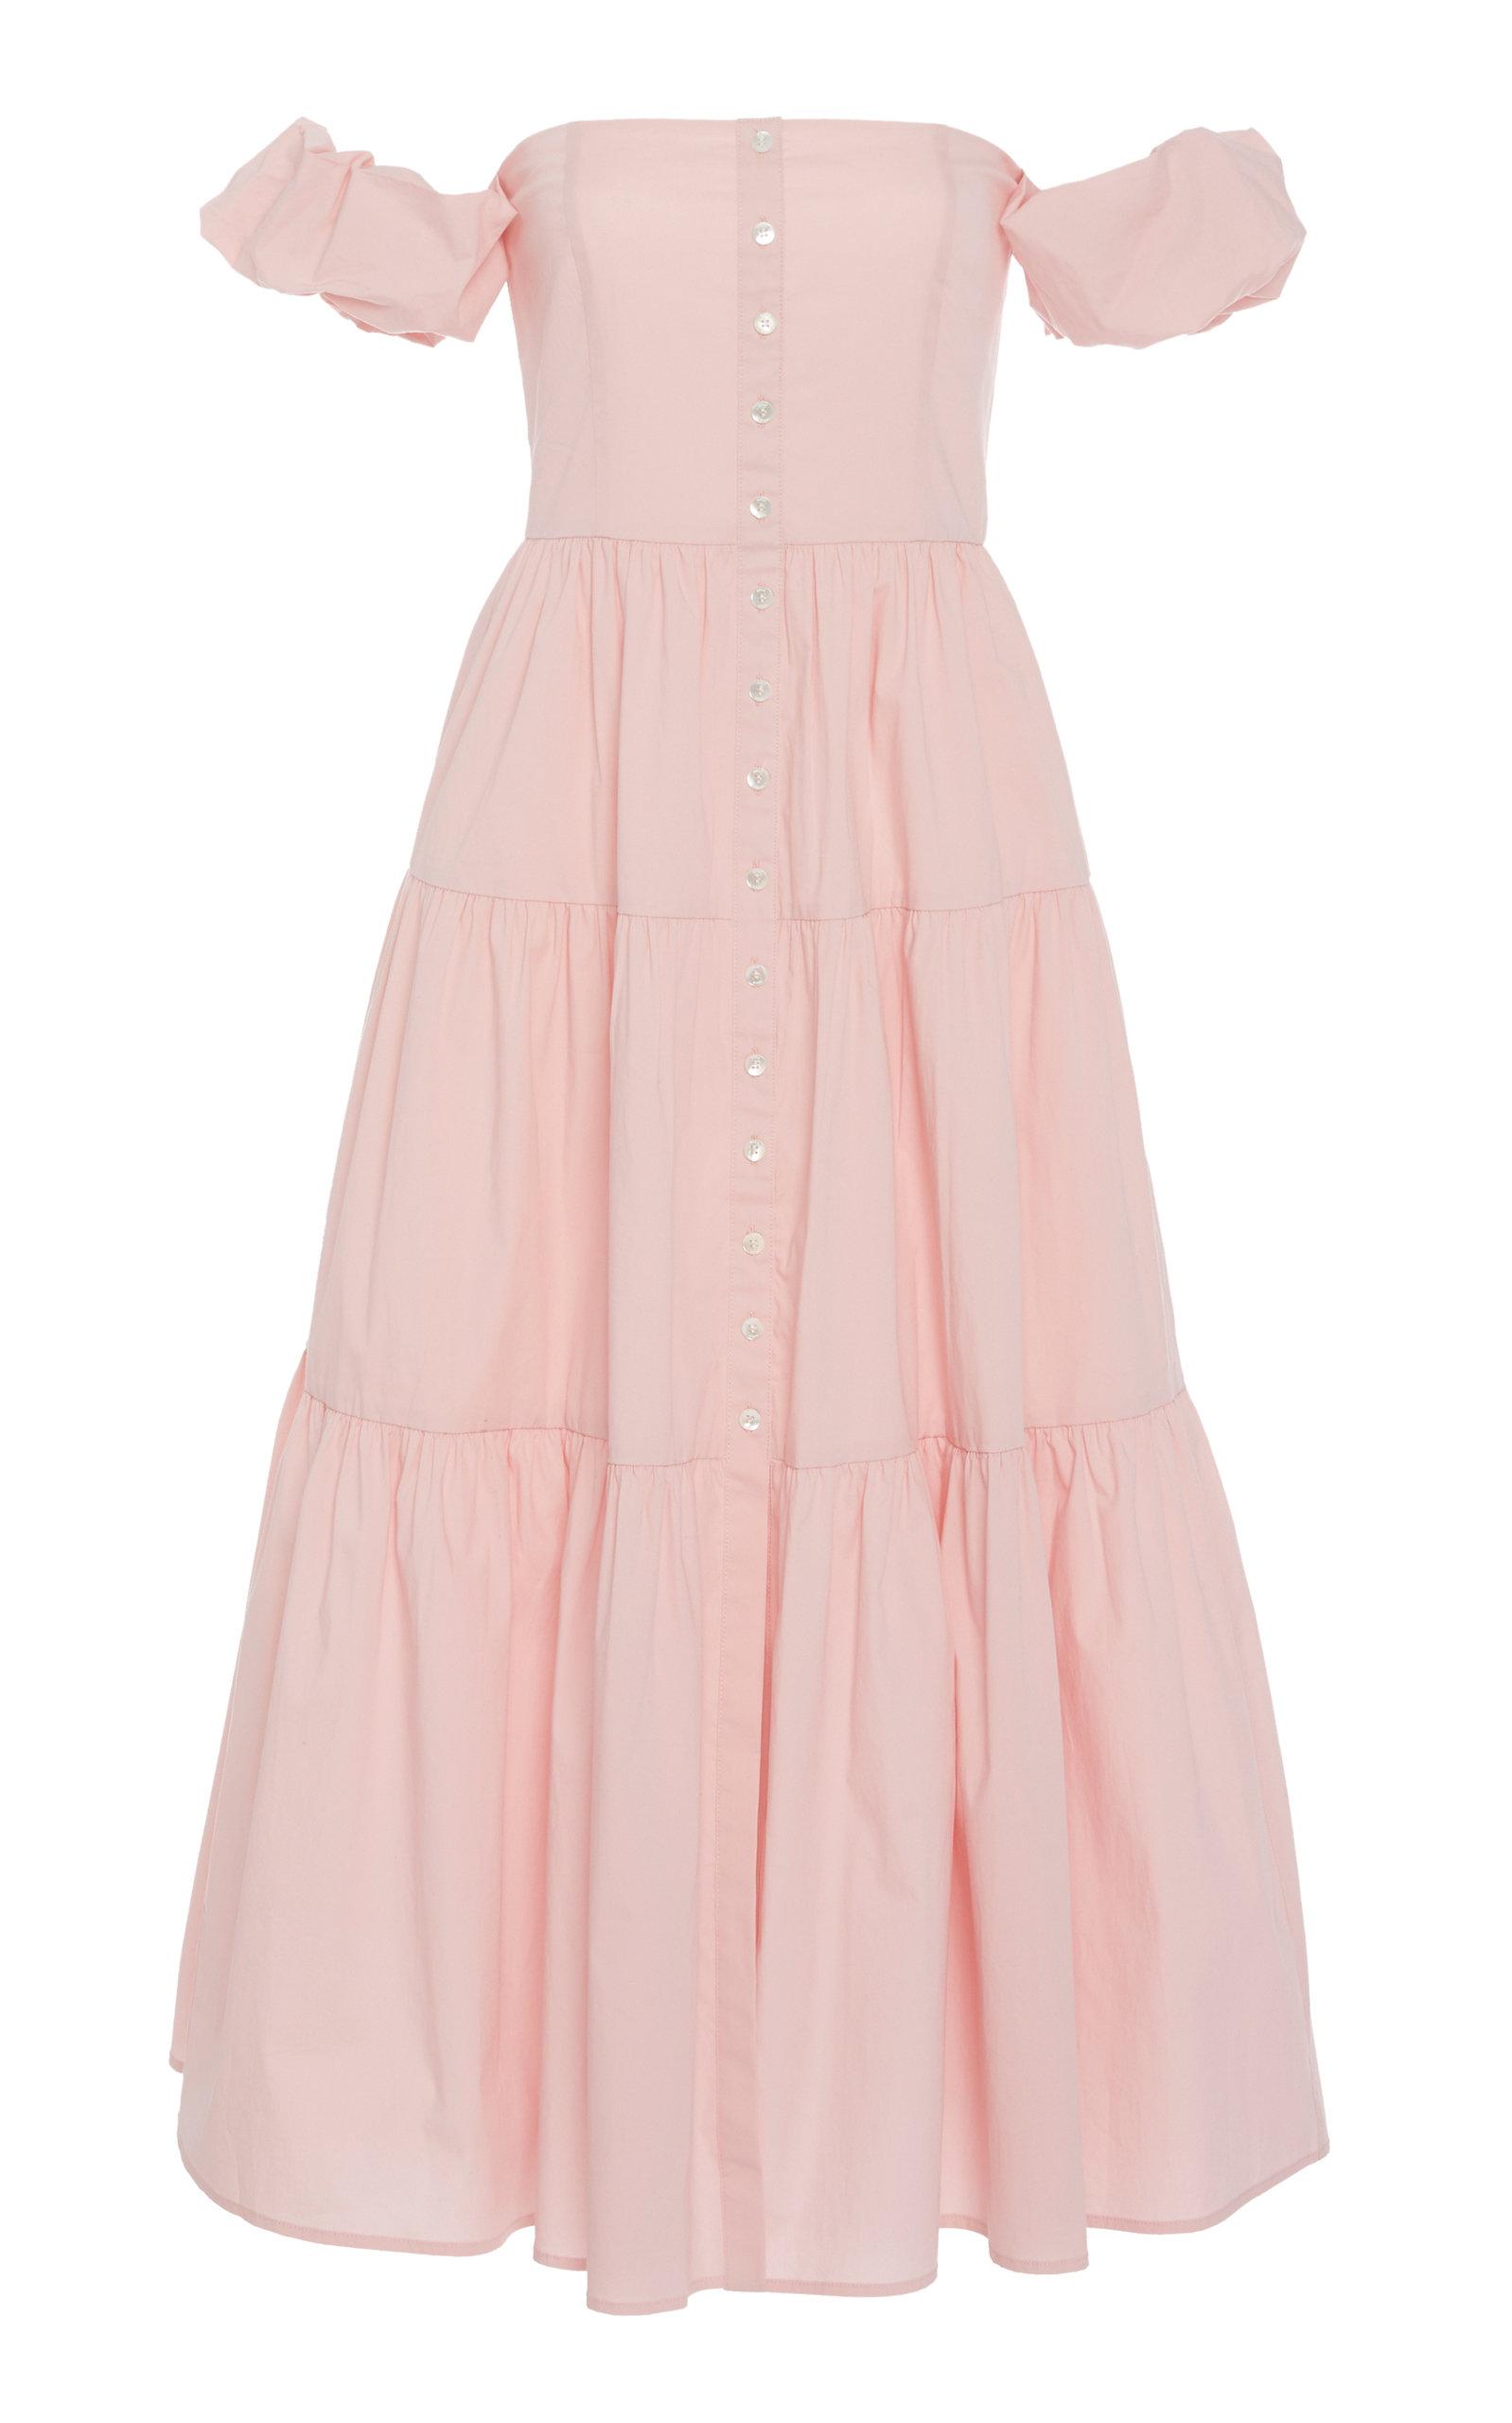 Buy Staud Elio Tiered Cotton-Poplin Off-the-Shoulder Dress online, shop Staud at the best price